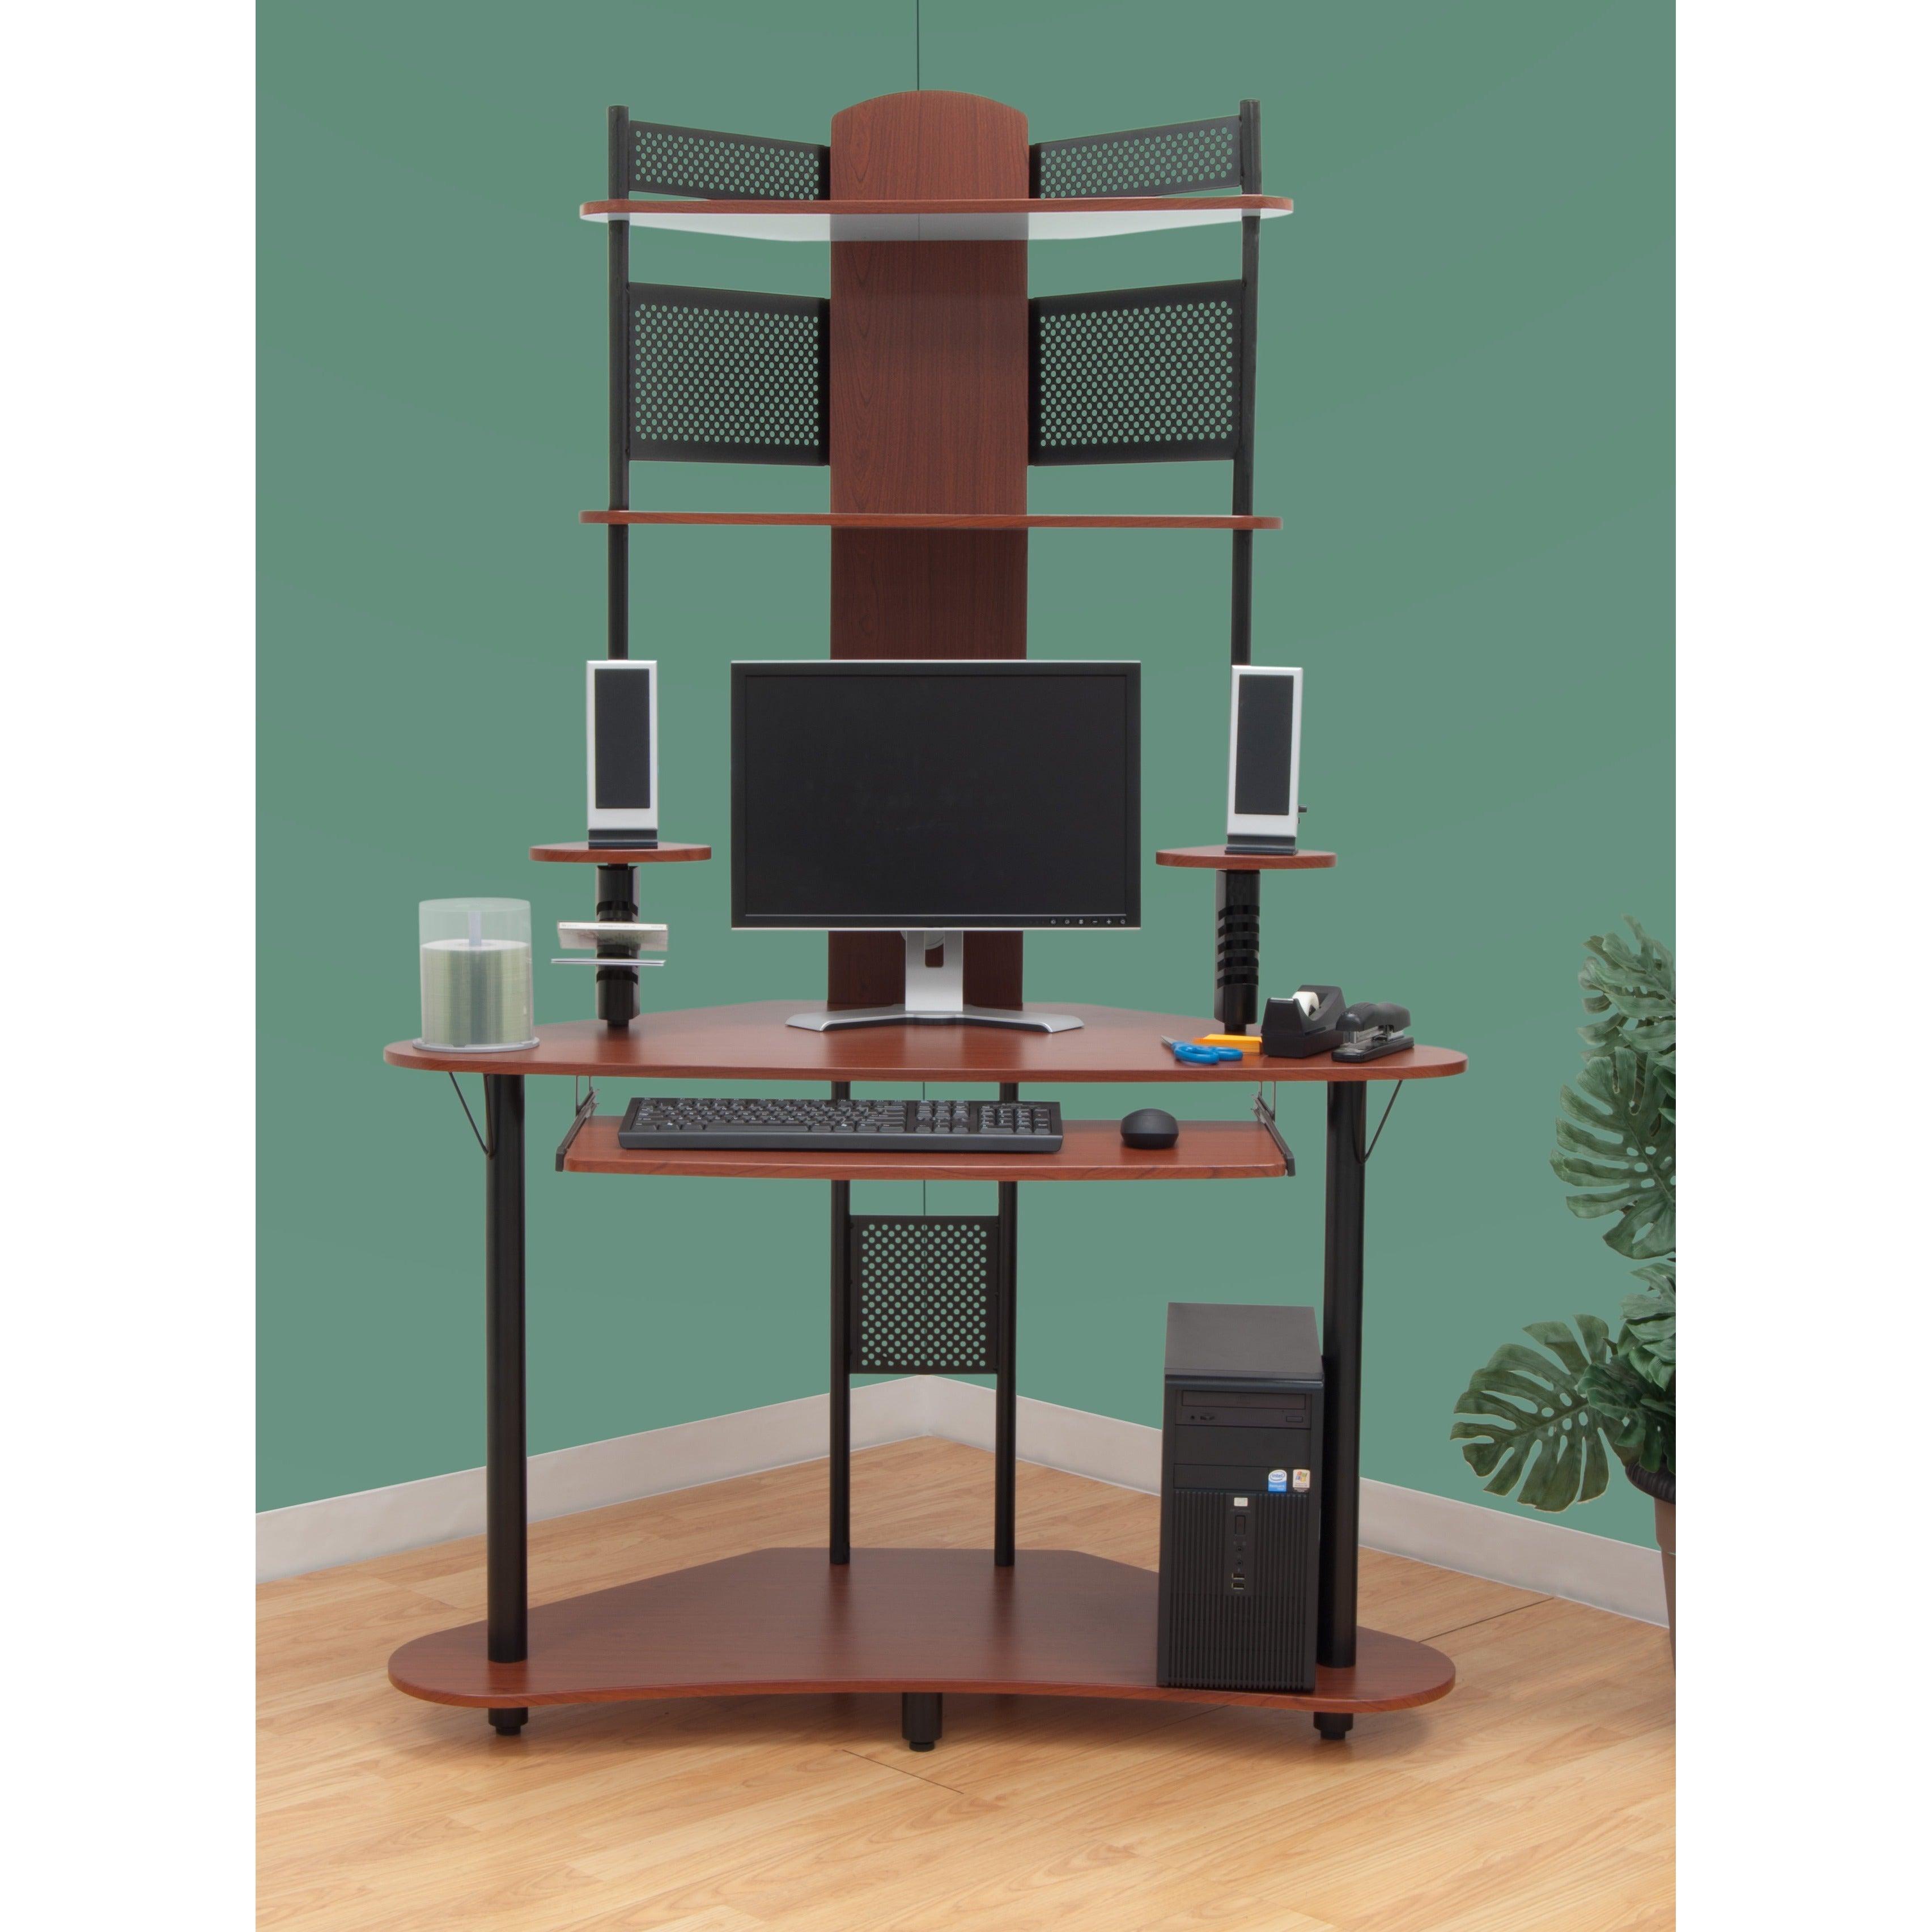 Calico Designs Arch Corner Computer Desk With Hutch Tower